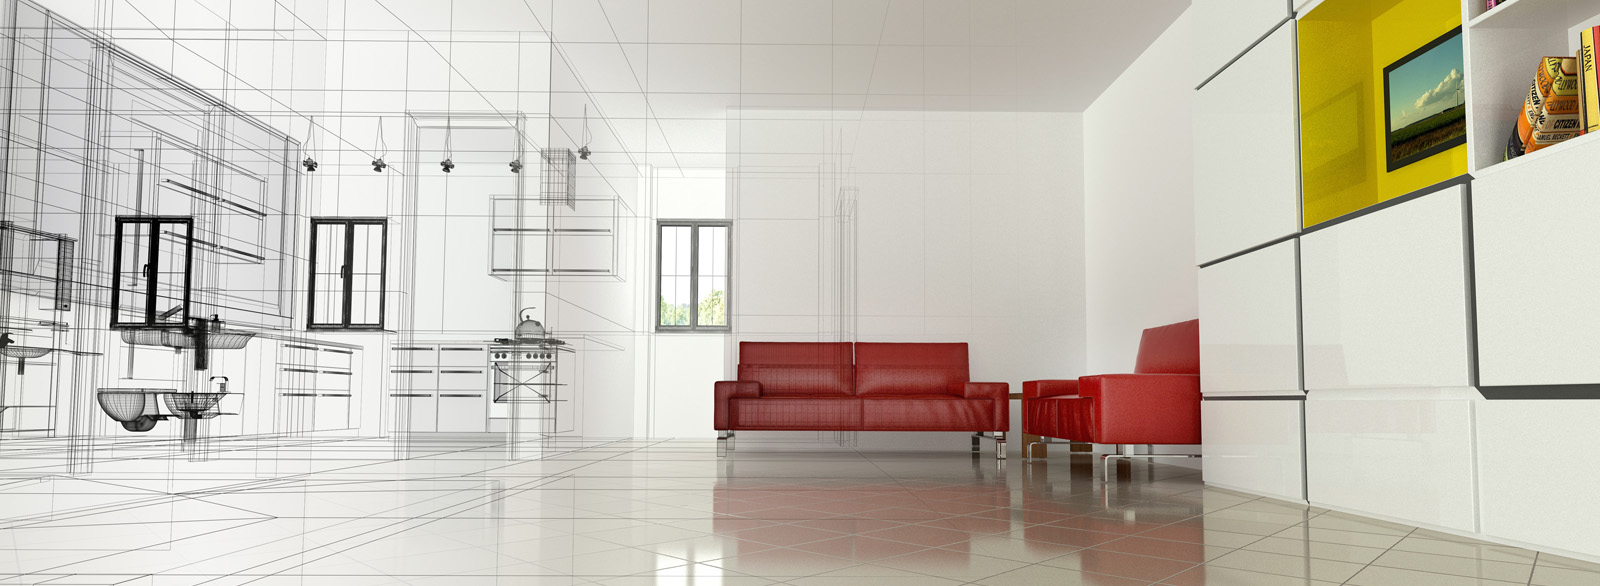 Dise o de oficinas curso de oficinas y espacios p blicos for Aprender diseno de interiores